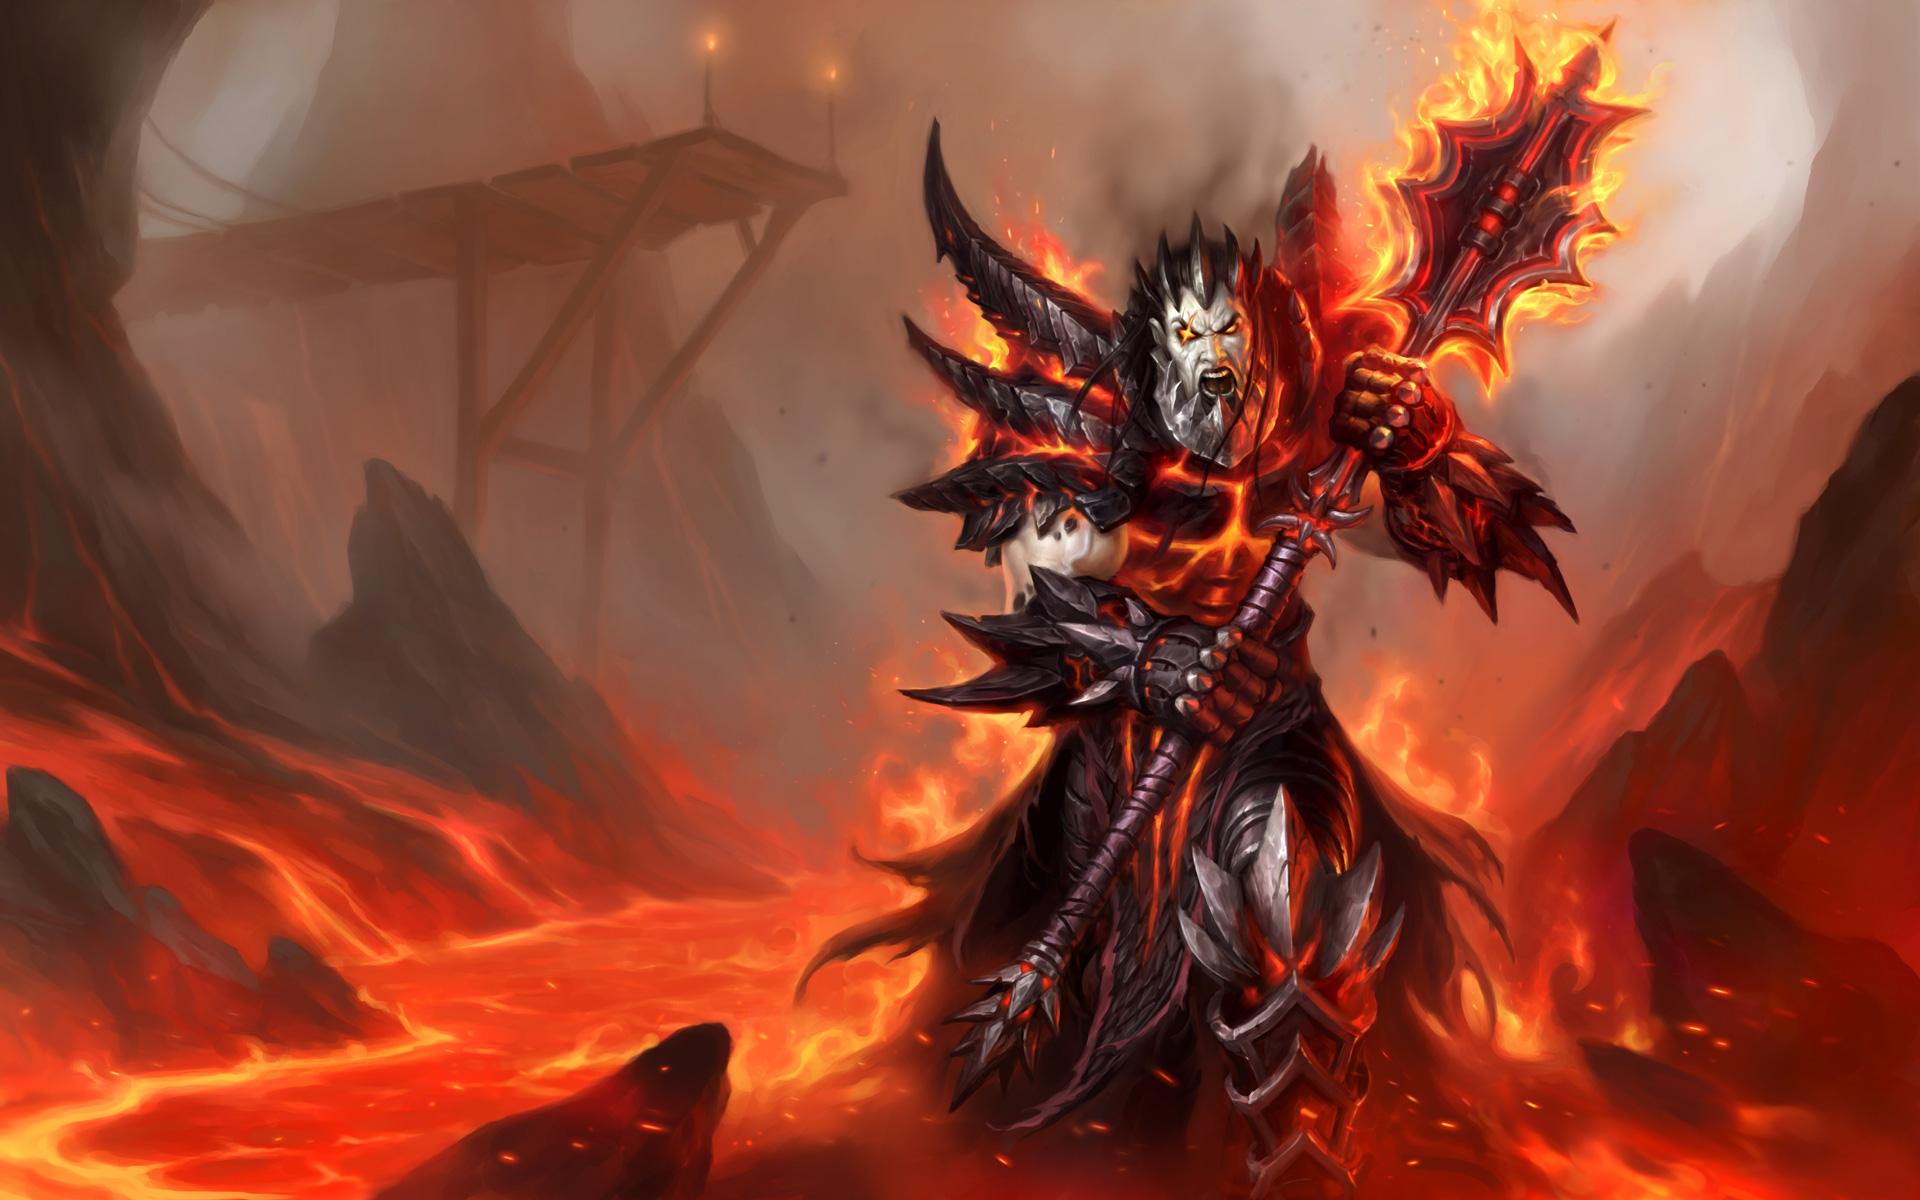 Free Hearthstone: Heroes of Warcraft Wallpaper in 1920x1200